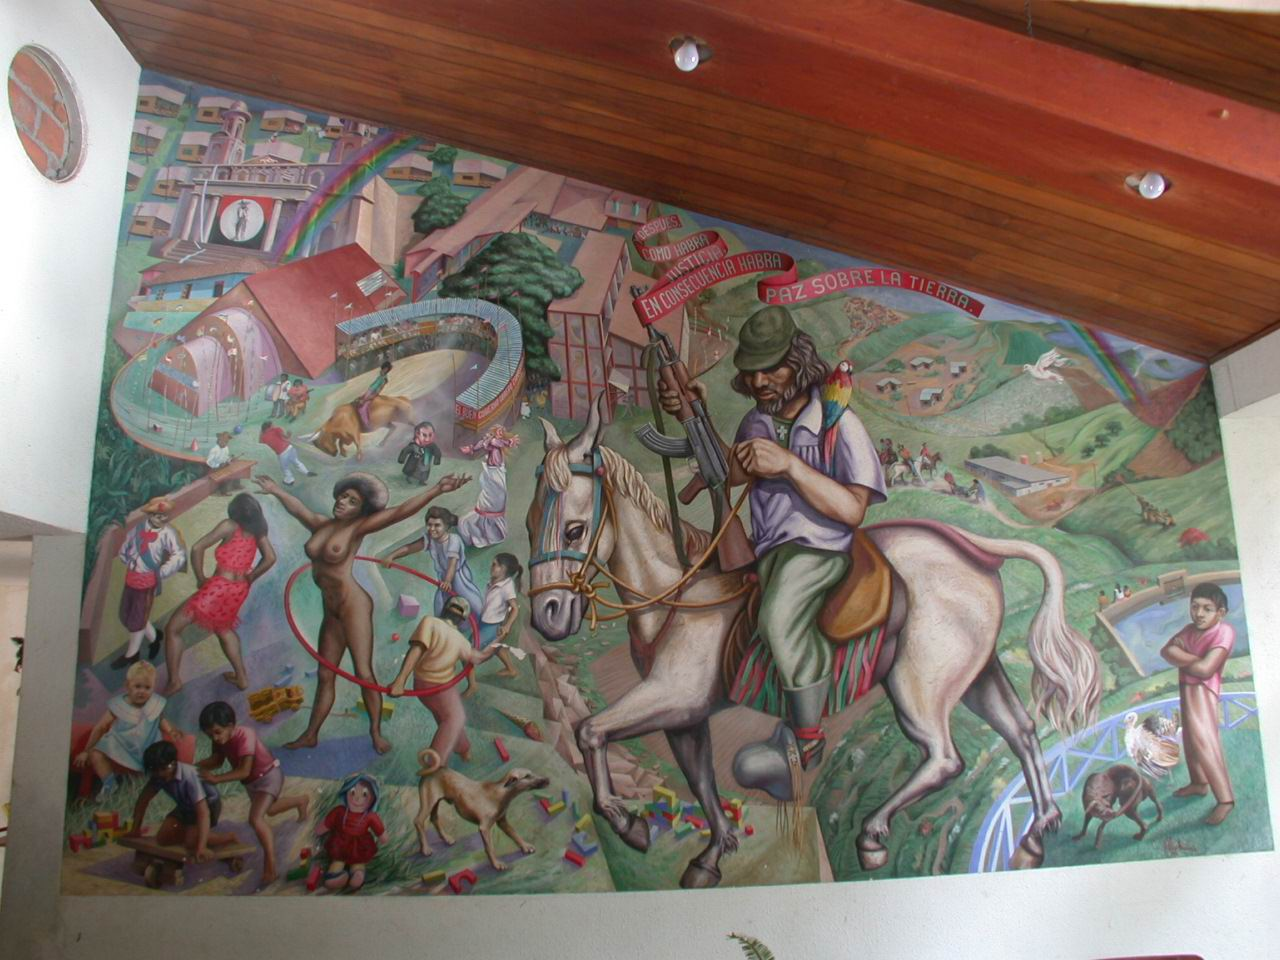 1987-1-il-buon-governocemoarmanagua-nicaragua